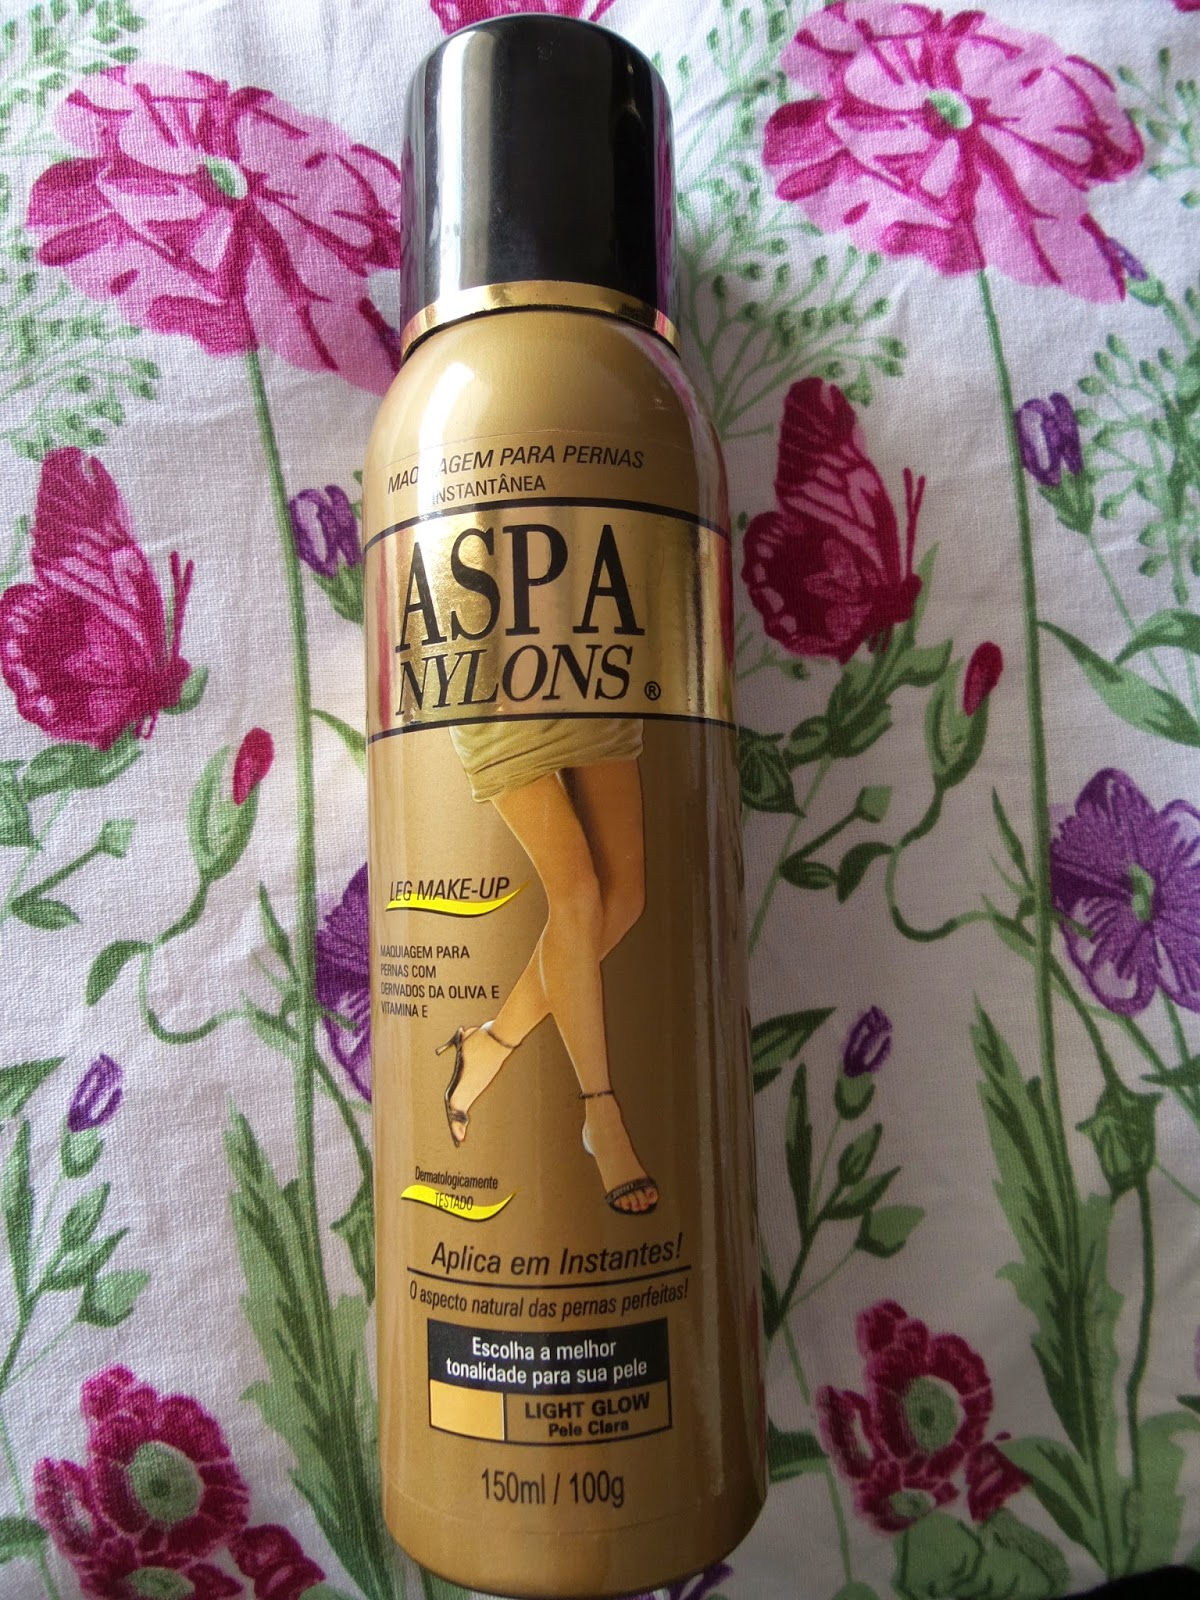 ad13d8d77 Maquiagem para as pernas Aspa Nylons